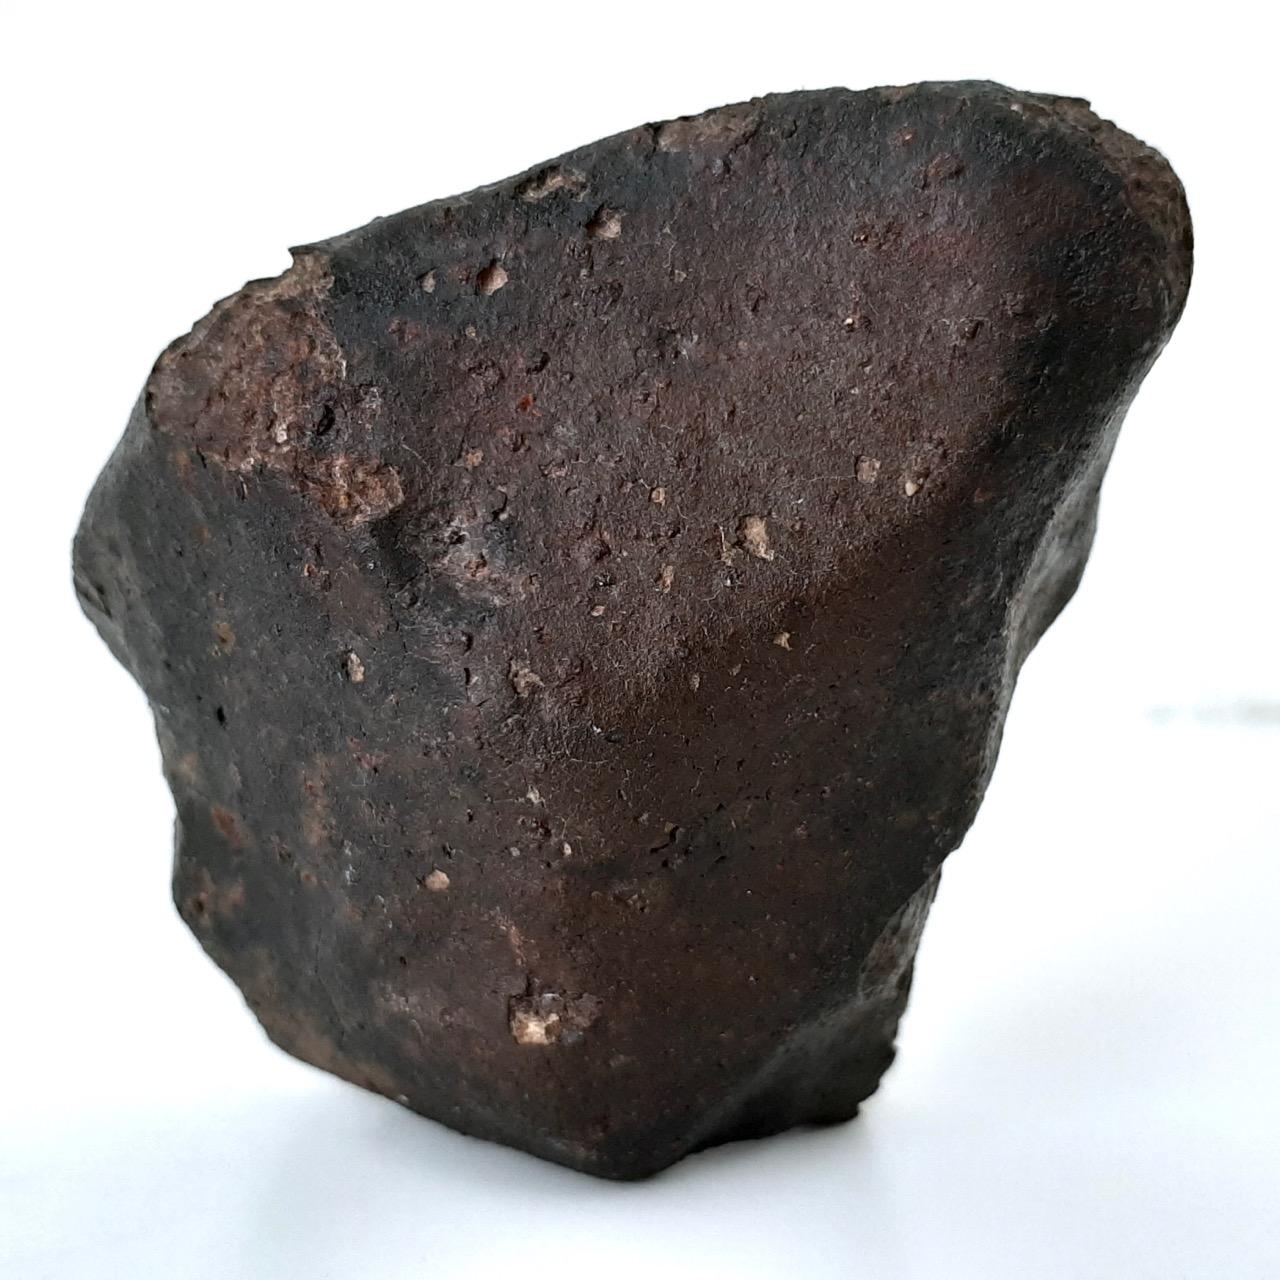 Sayh al Uhaymir. SaU 001 meteorite. 95% crust.